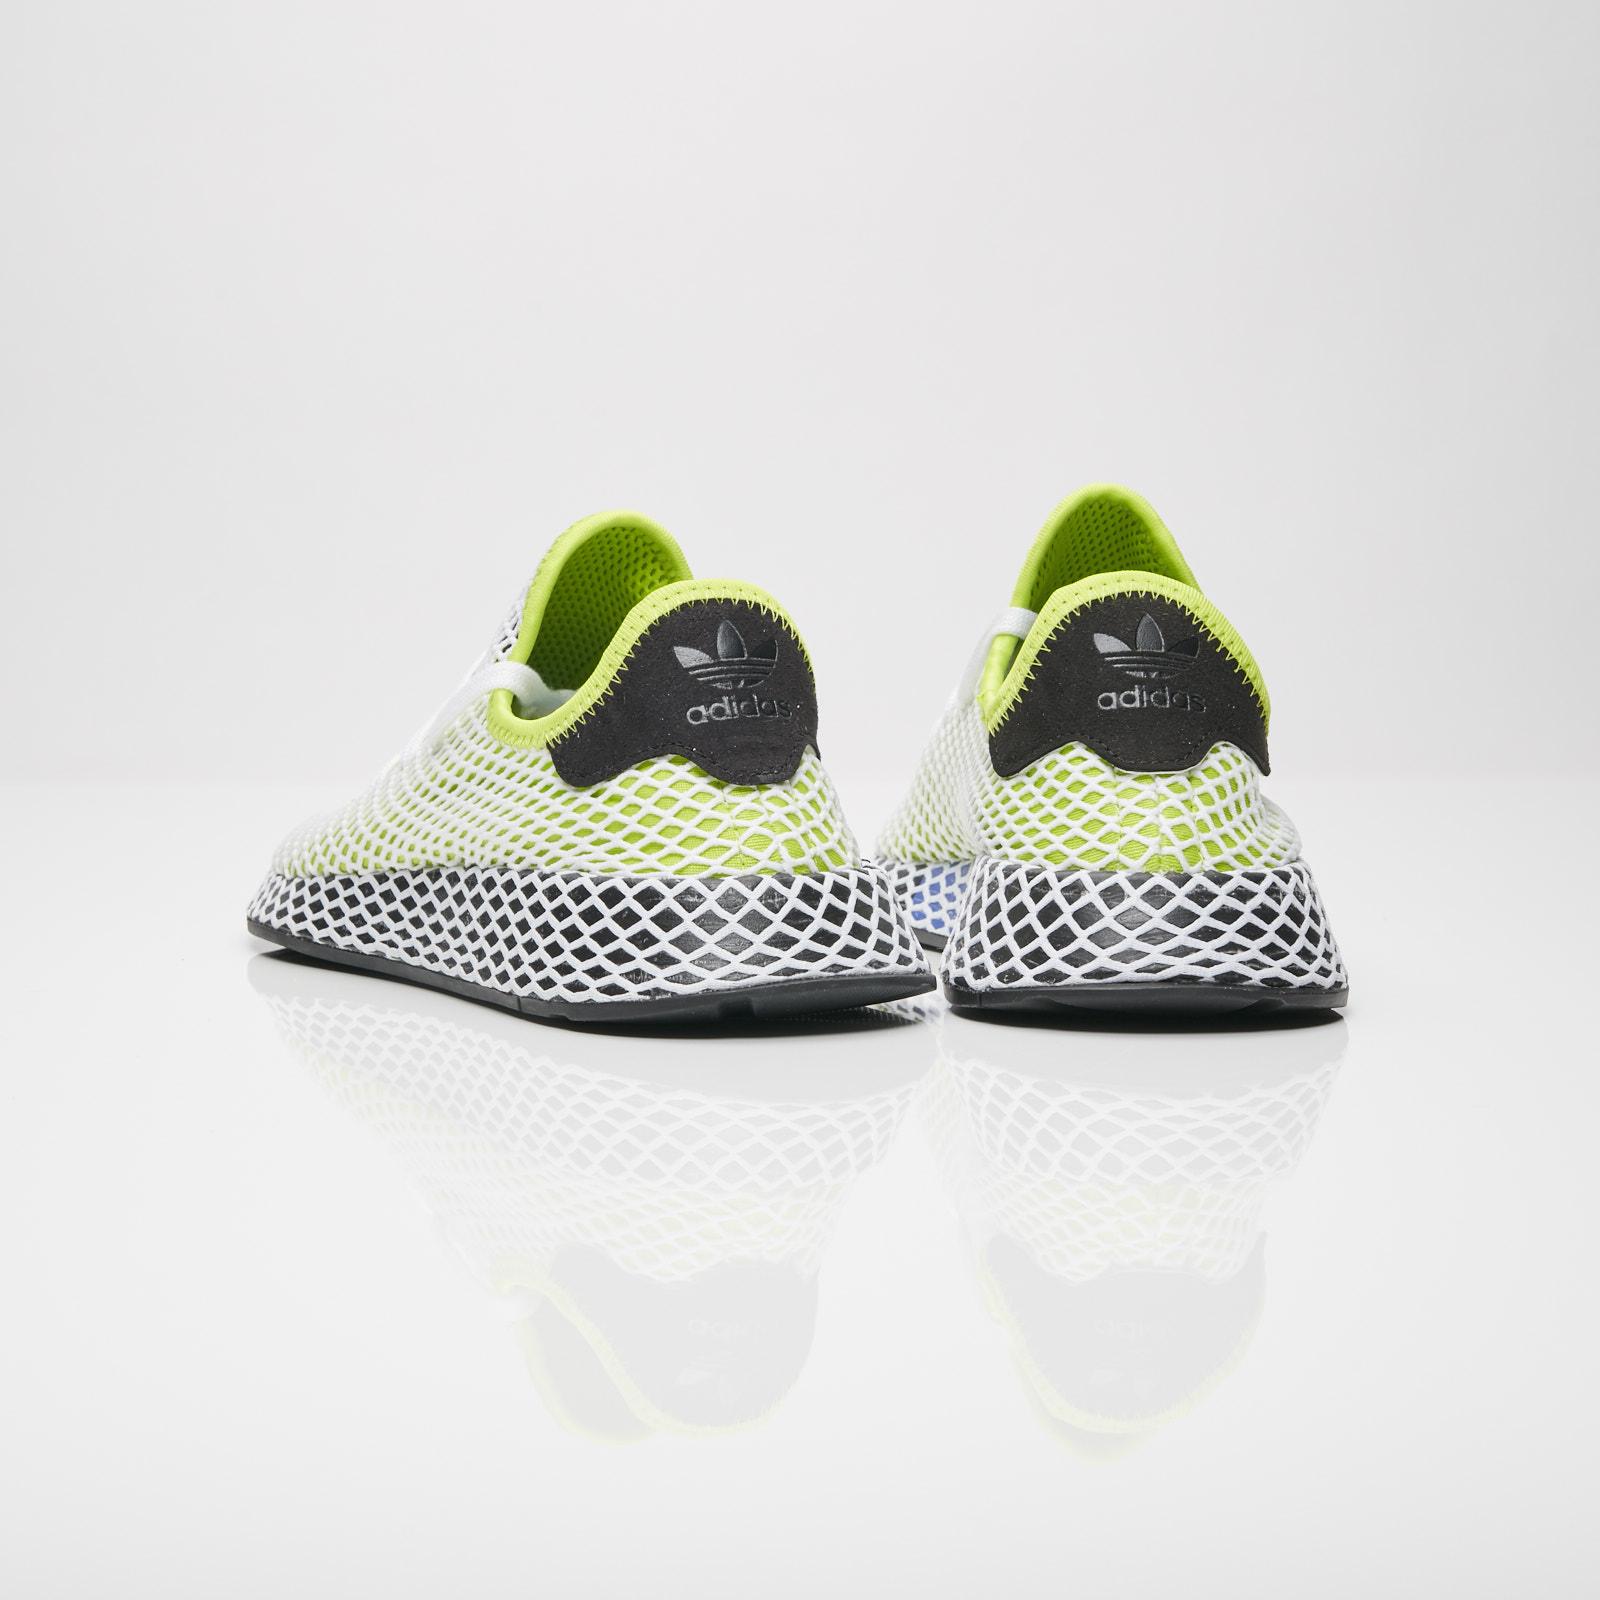 5b35f944c6c22 adidas Originals Deerupt Runner - 6. Close. Previous